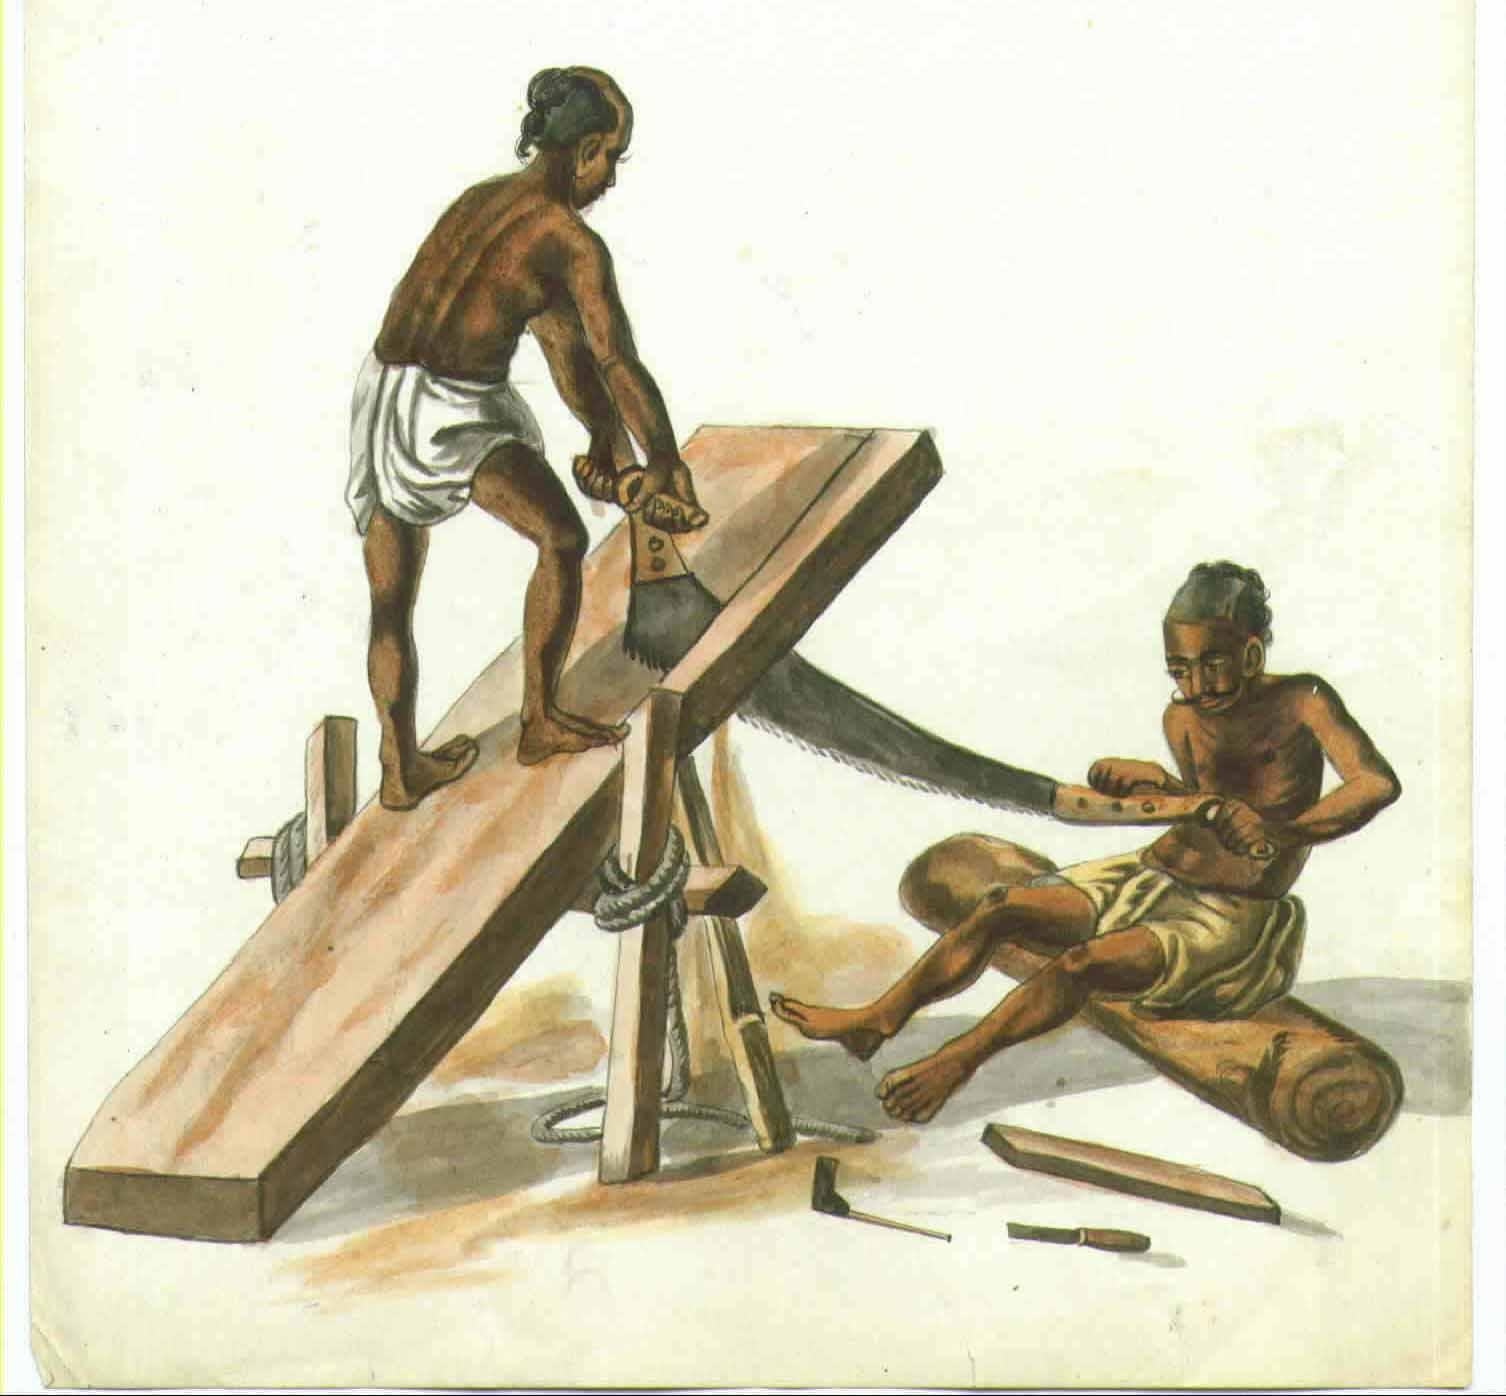 Indian clipart carpenter A with merchant *A grain